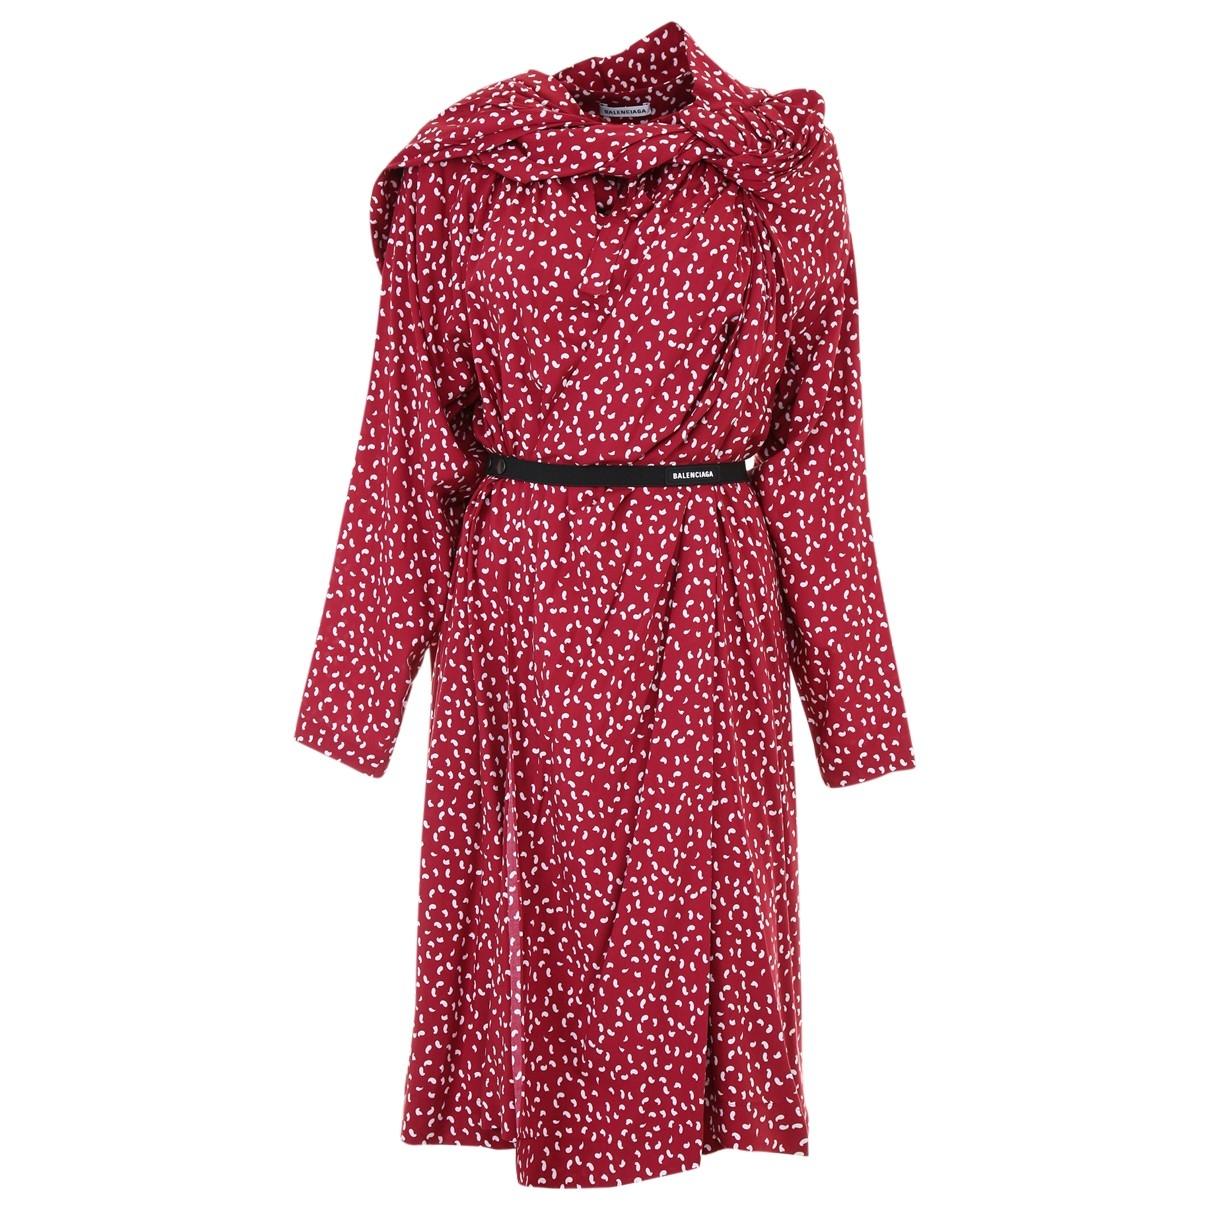 Balenciaga \N dress for Women 36 FR